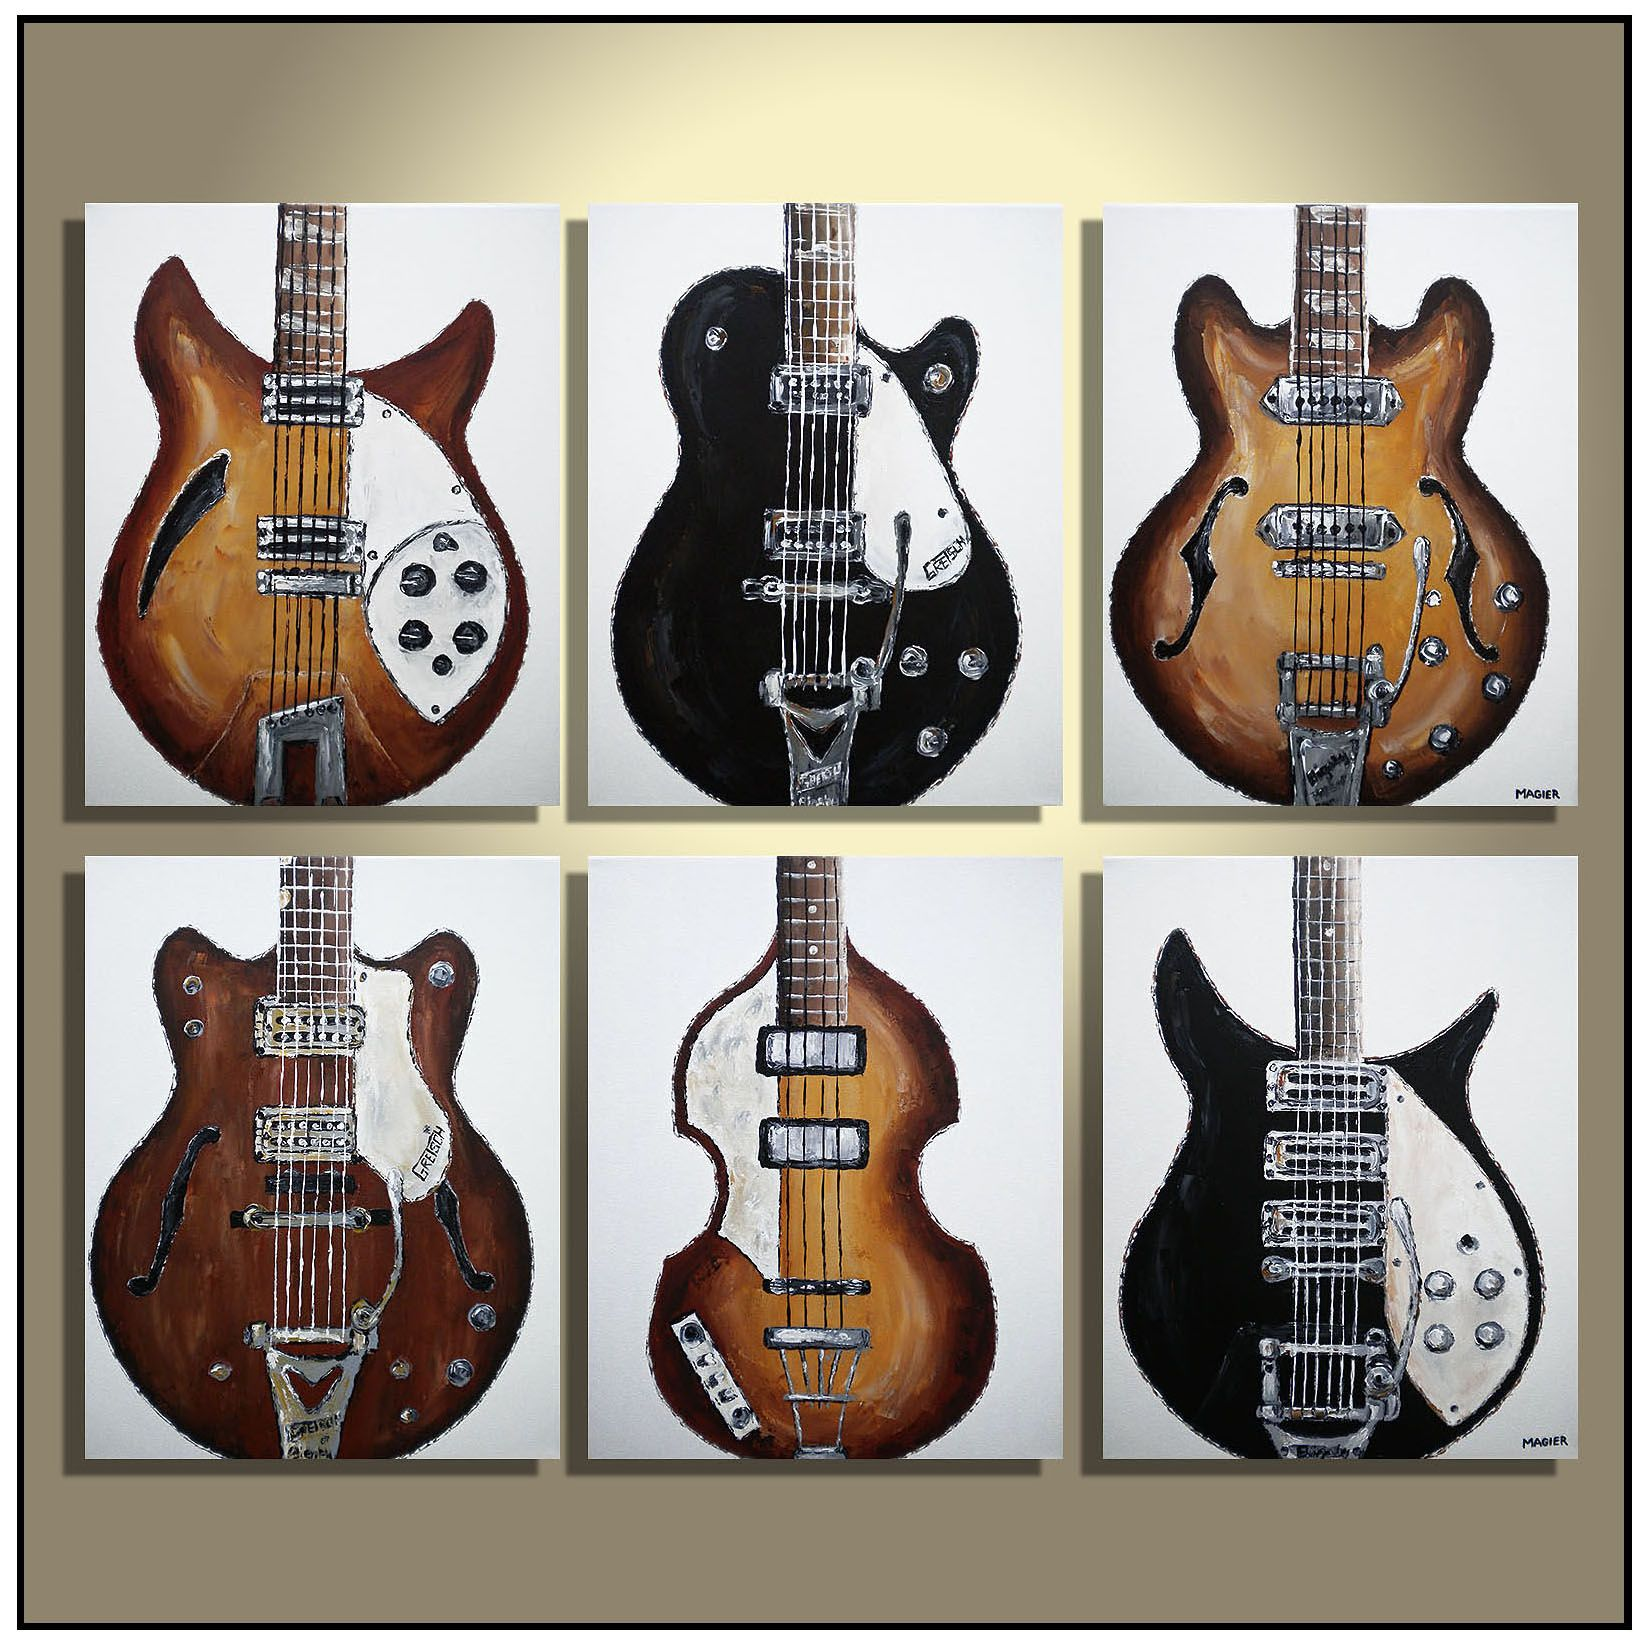 the beatles guitars set of 6 music studio ideas original guitar painting on canvas guitar. Black Bedroom Furniture Sets. Home Design Ideas